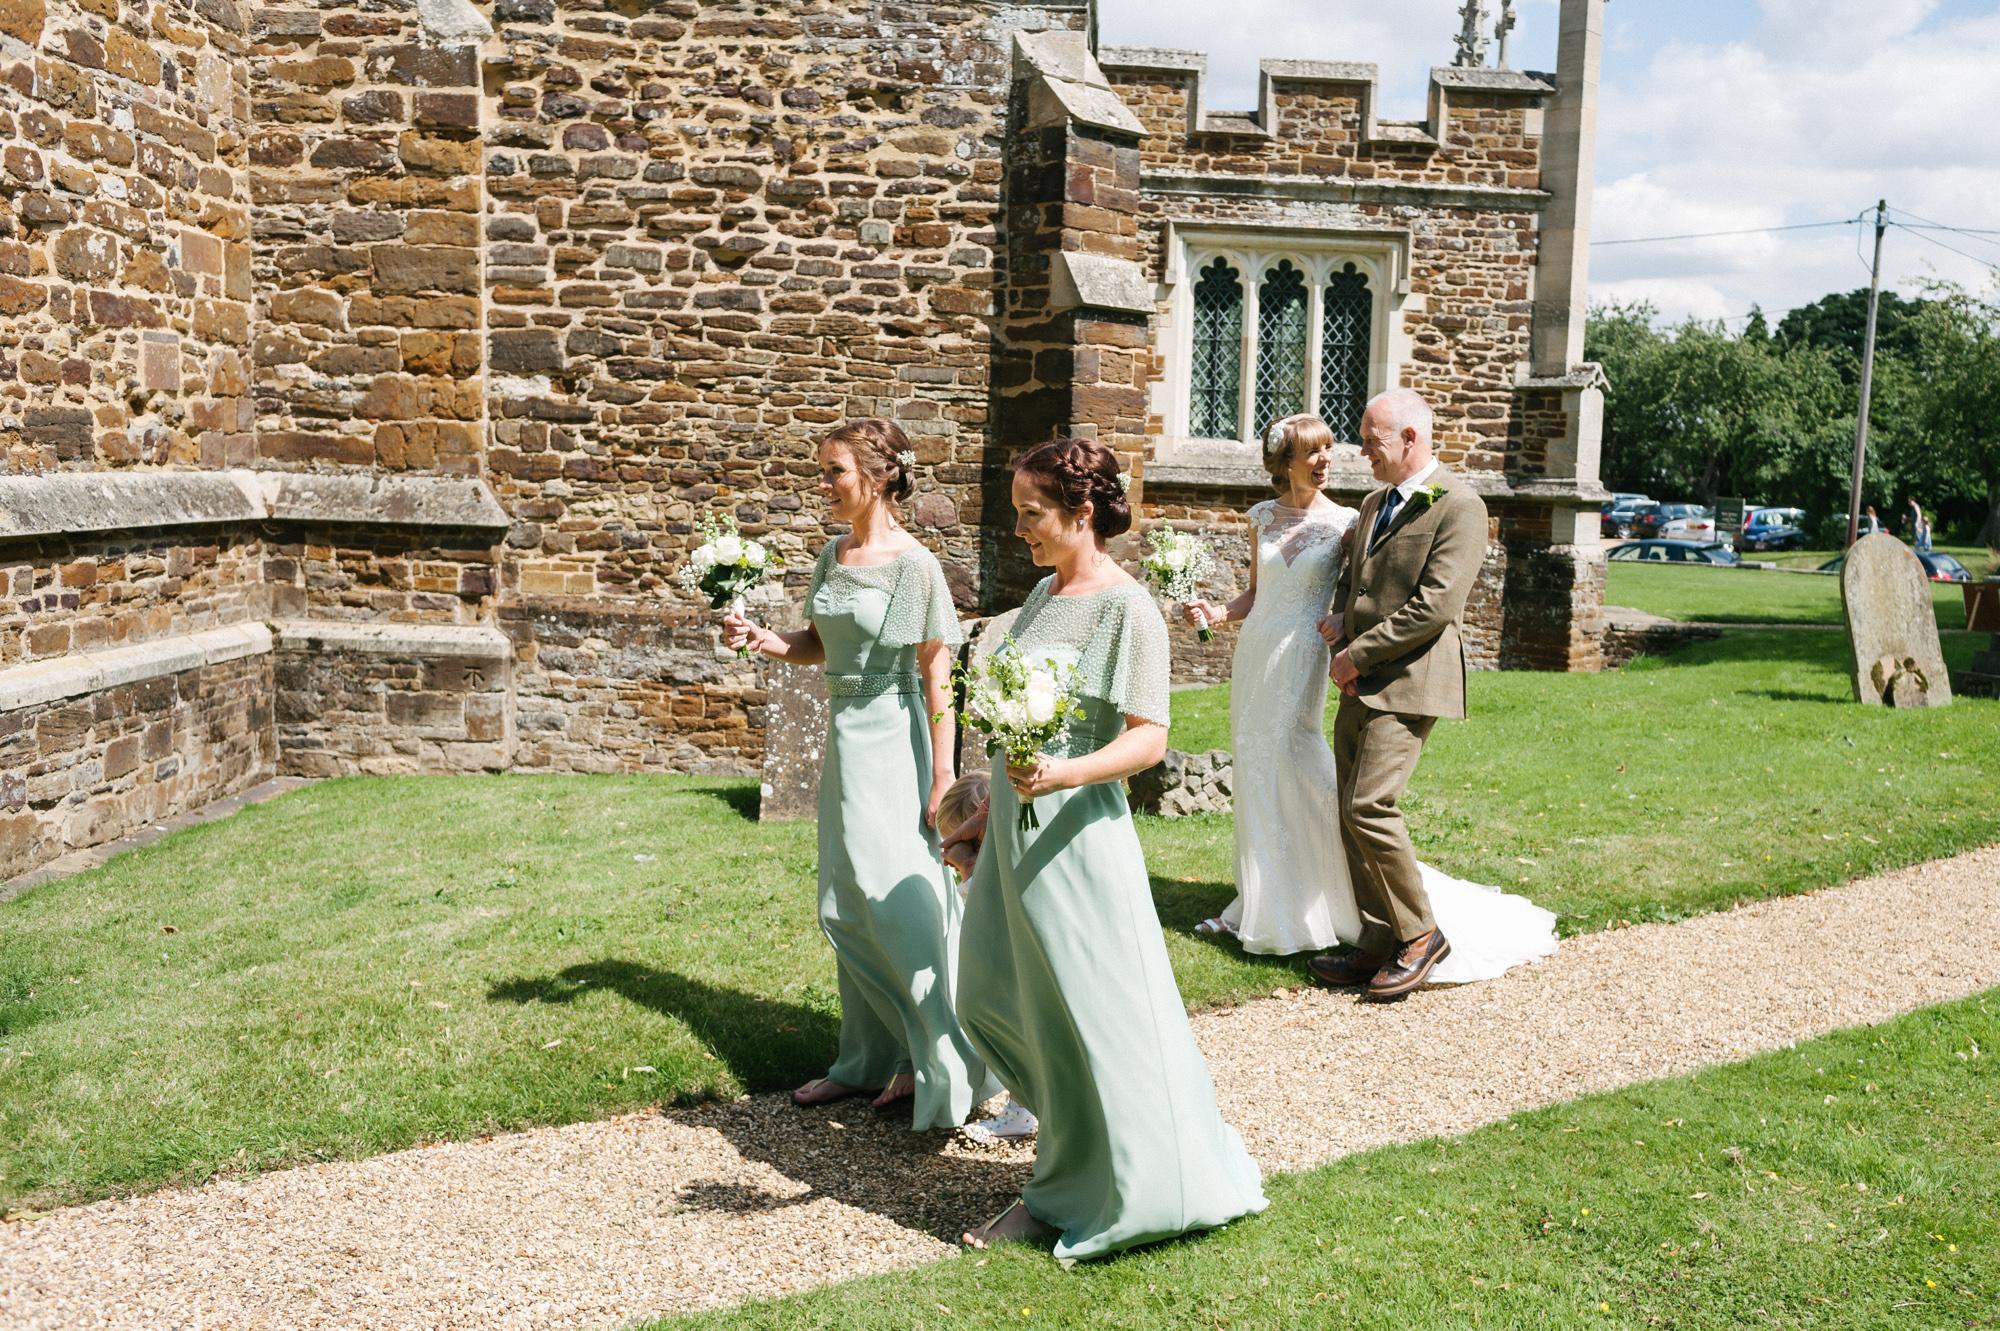 Cricket Club Wedding Tea Party Eversholt Bedfordshire-24